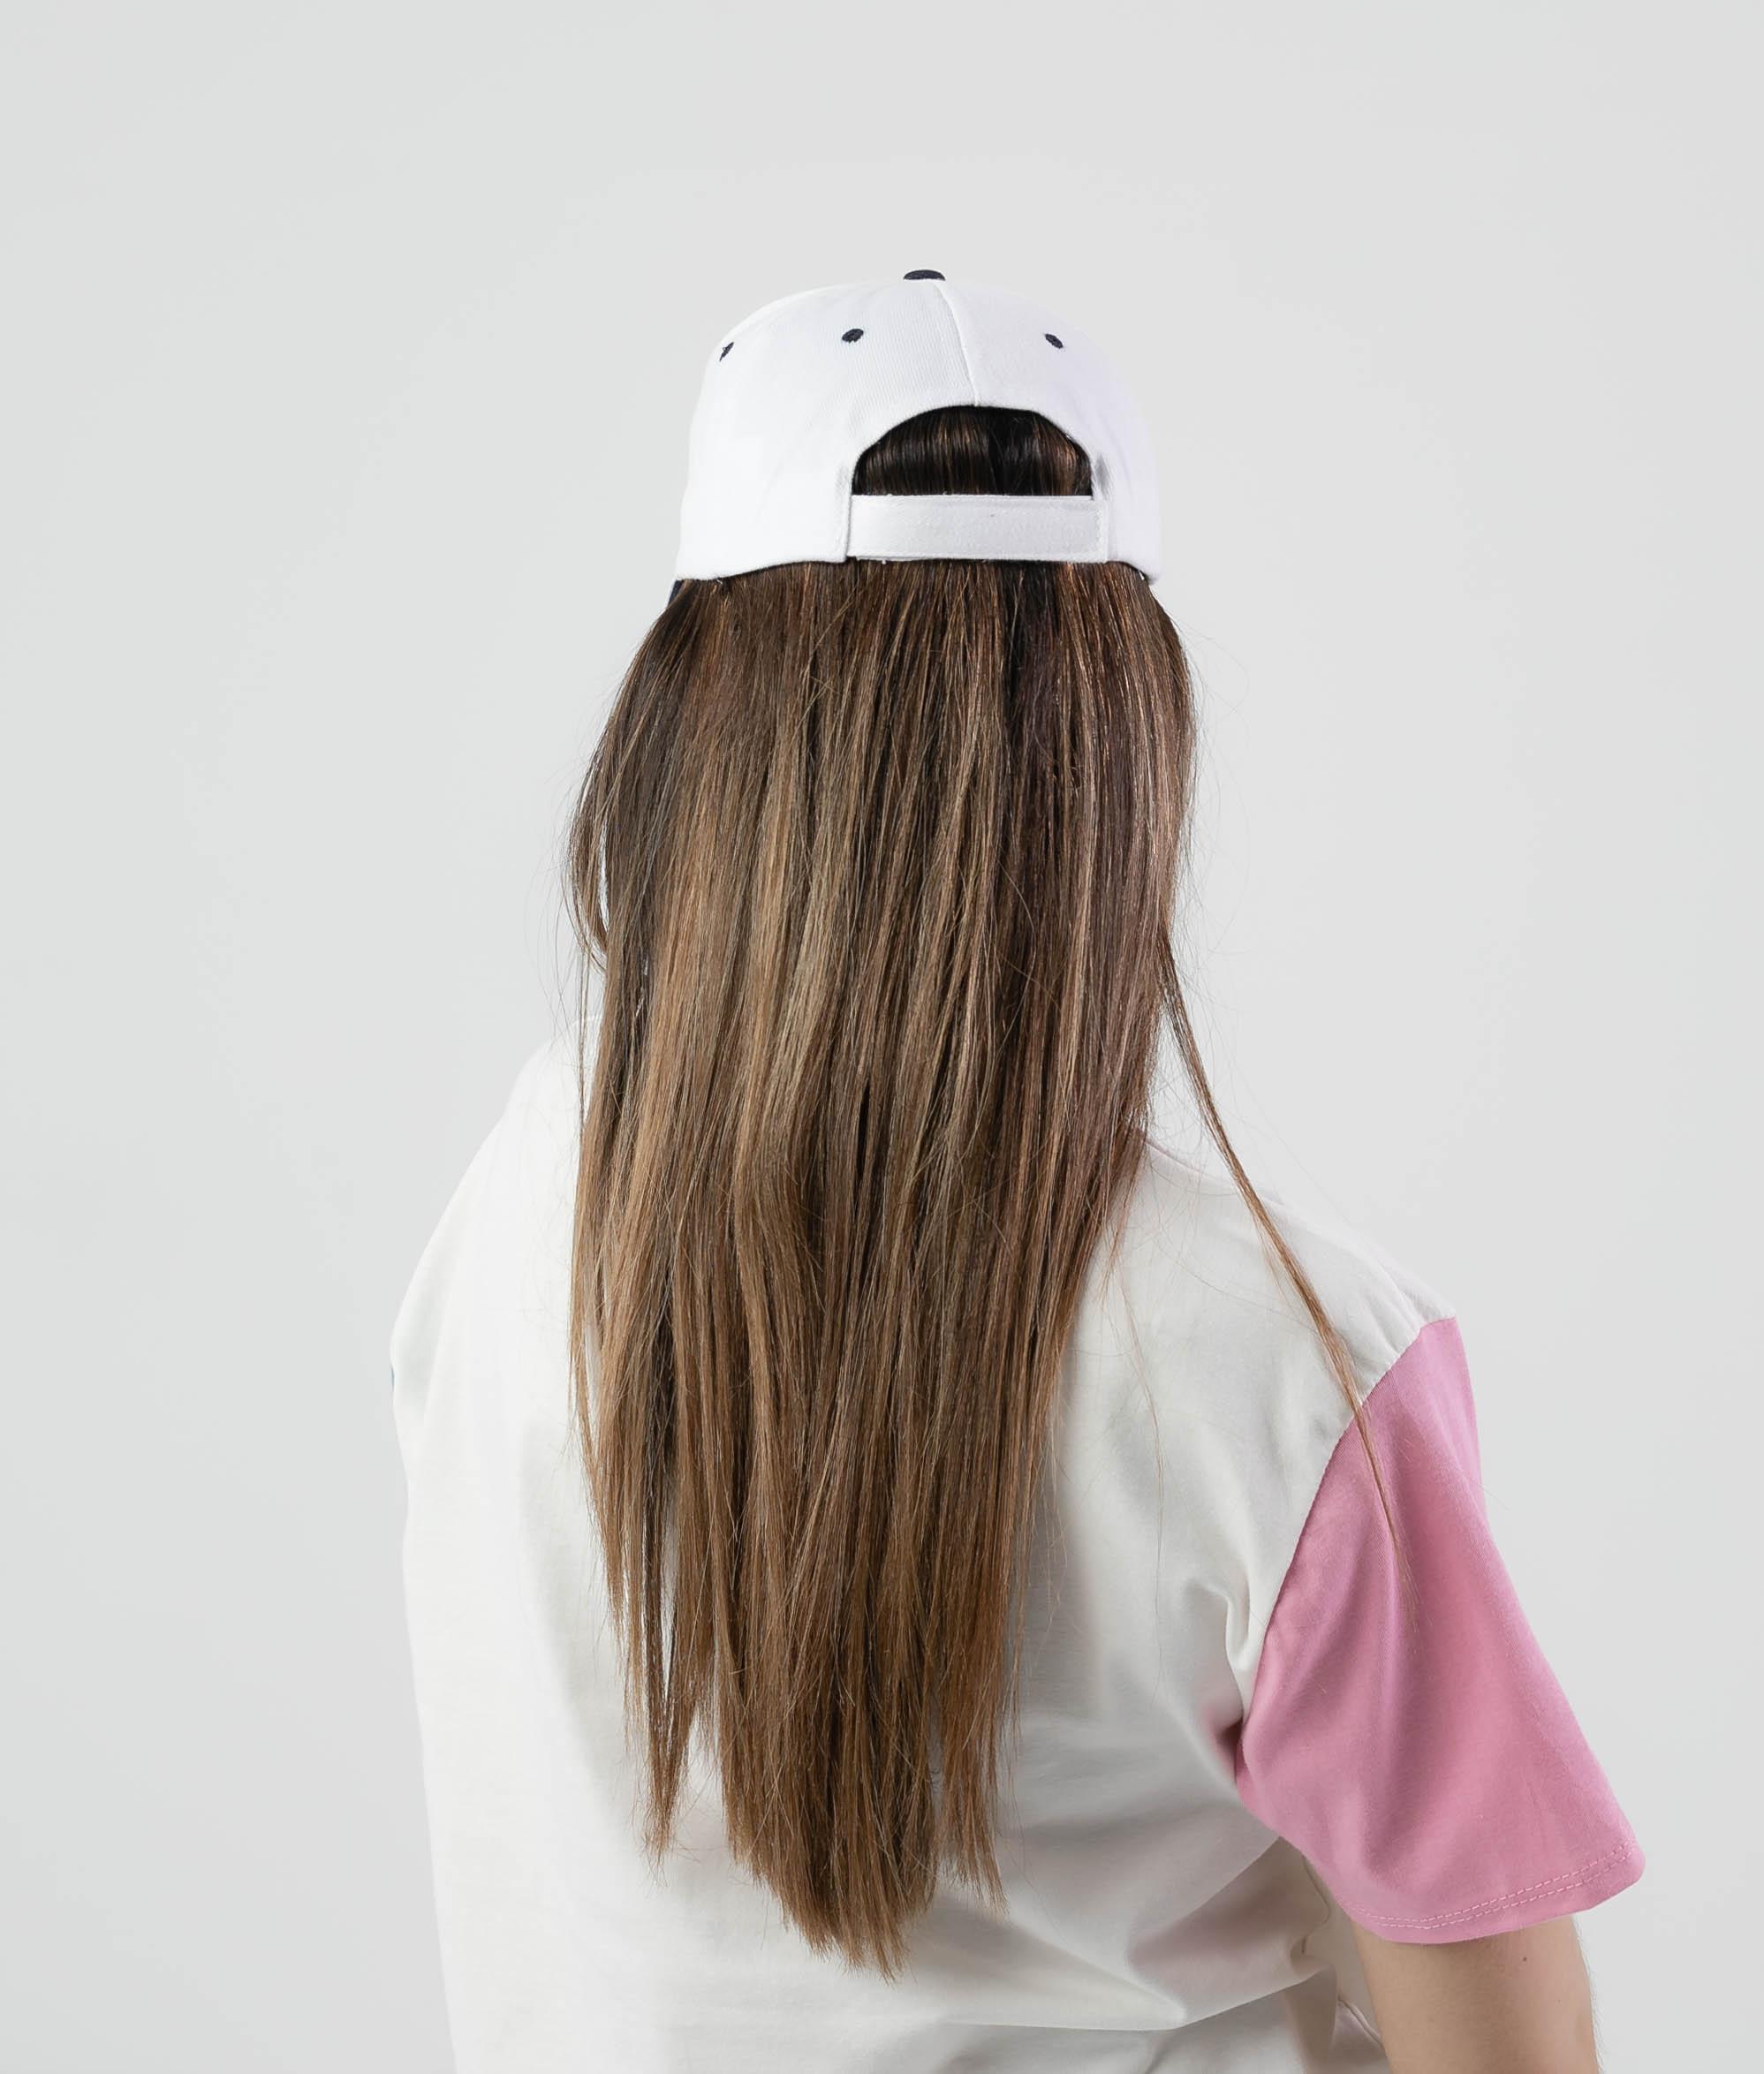 PANY CAP - WHITE